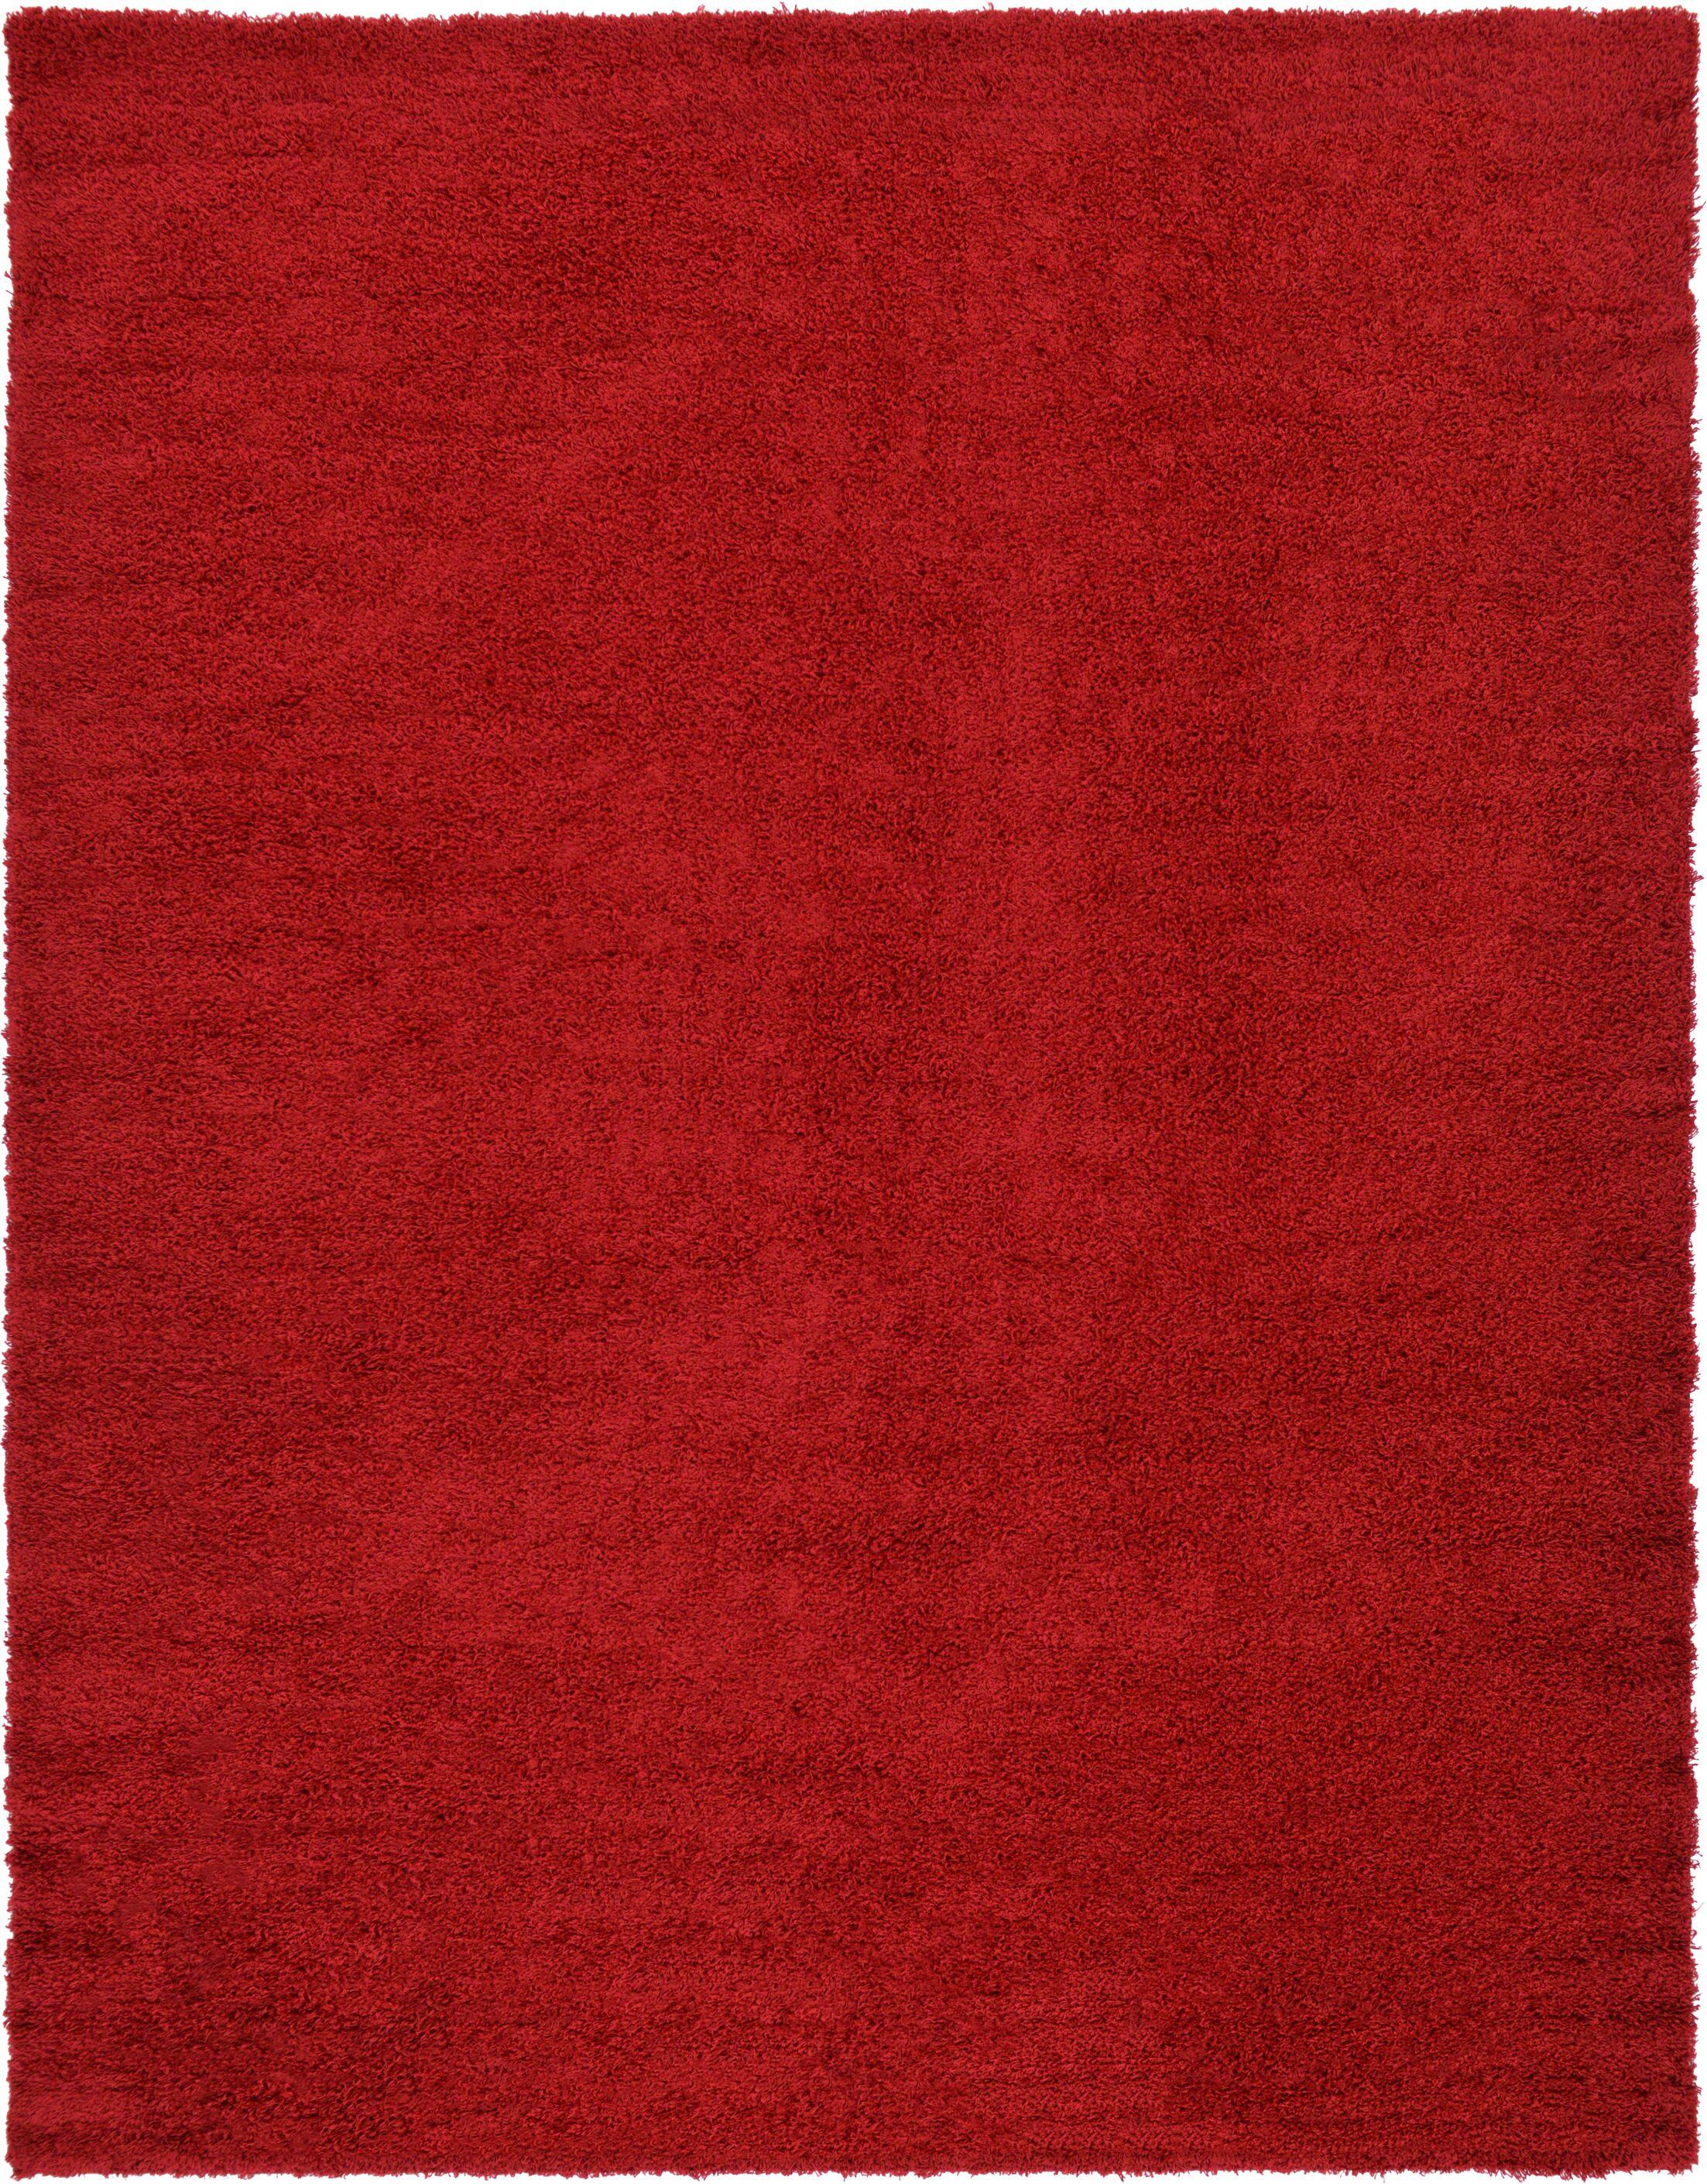 Madison Basic  Cherry Red Area Rug Rug Size: Rectangle 10' x 13'